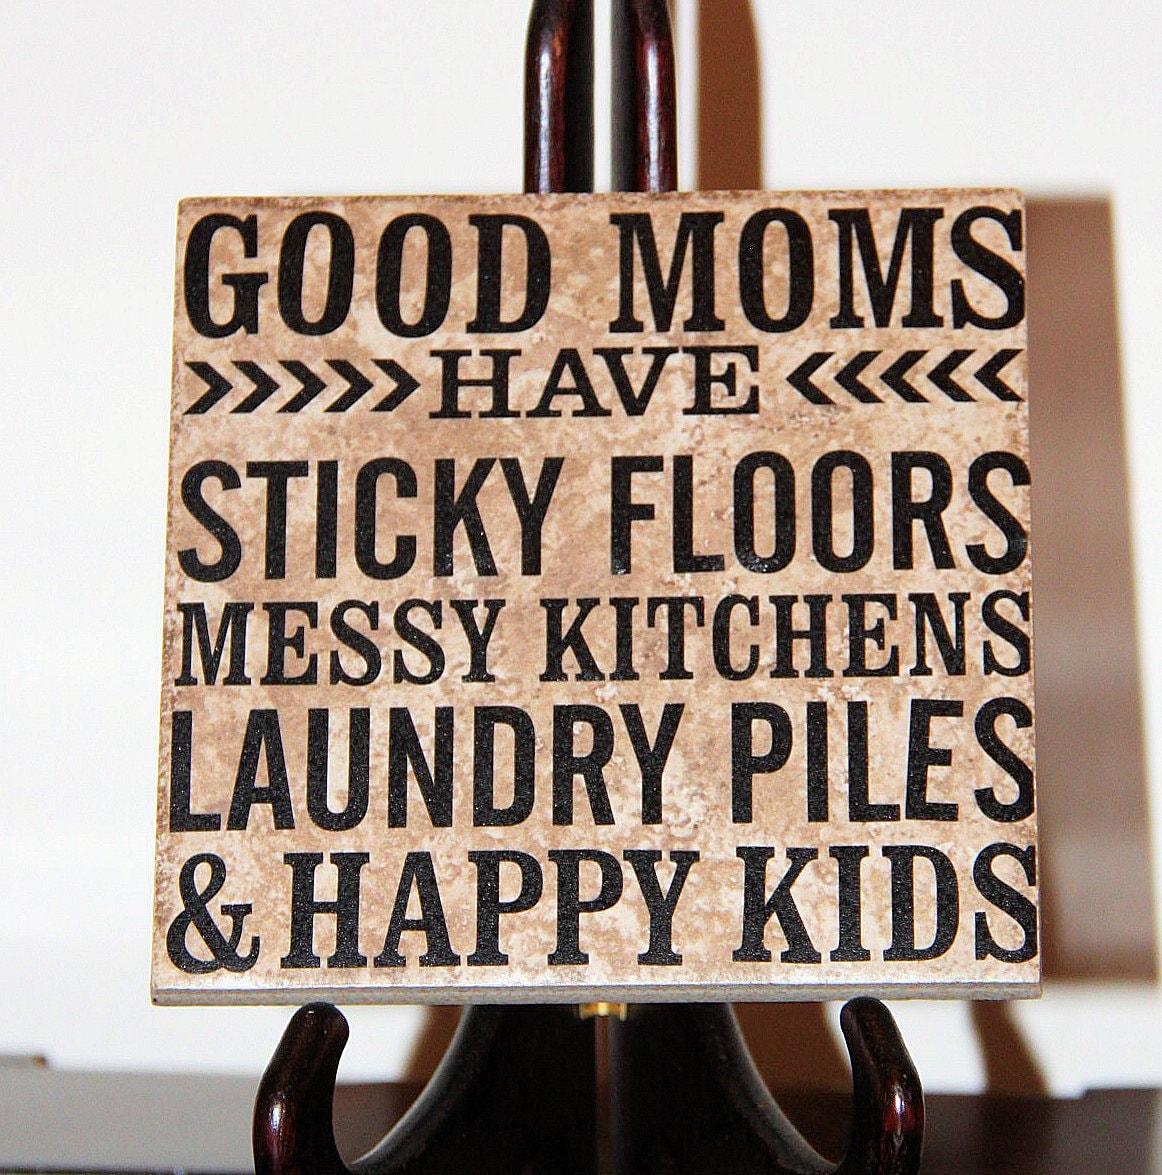 Messy Kitchen Kids: Good Moms Have Sticky Floors Messy Kitchens Laundry By